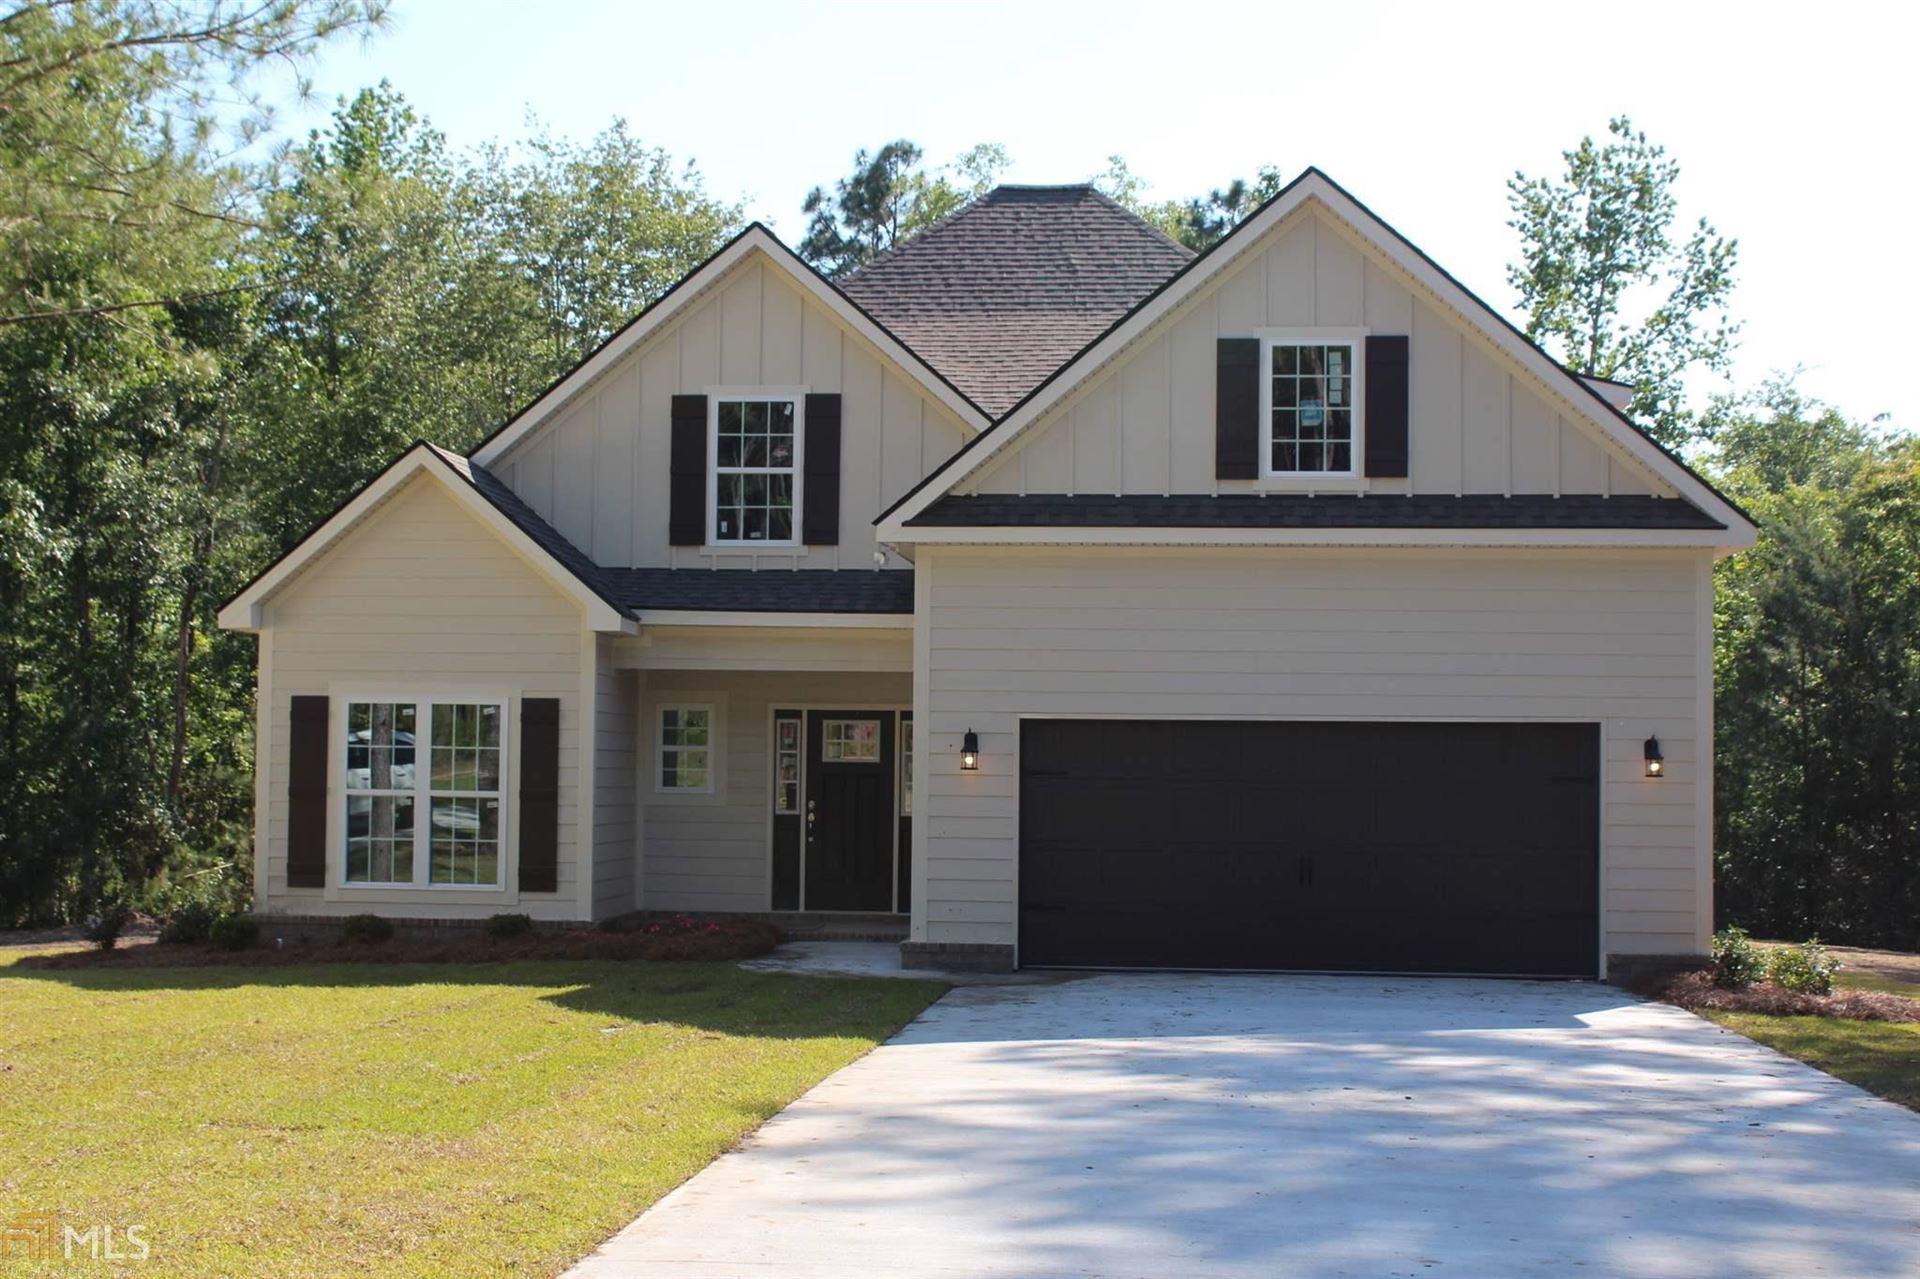 112 Spendoll Ct, Statesboro, GA 30461 - #: 8832667